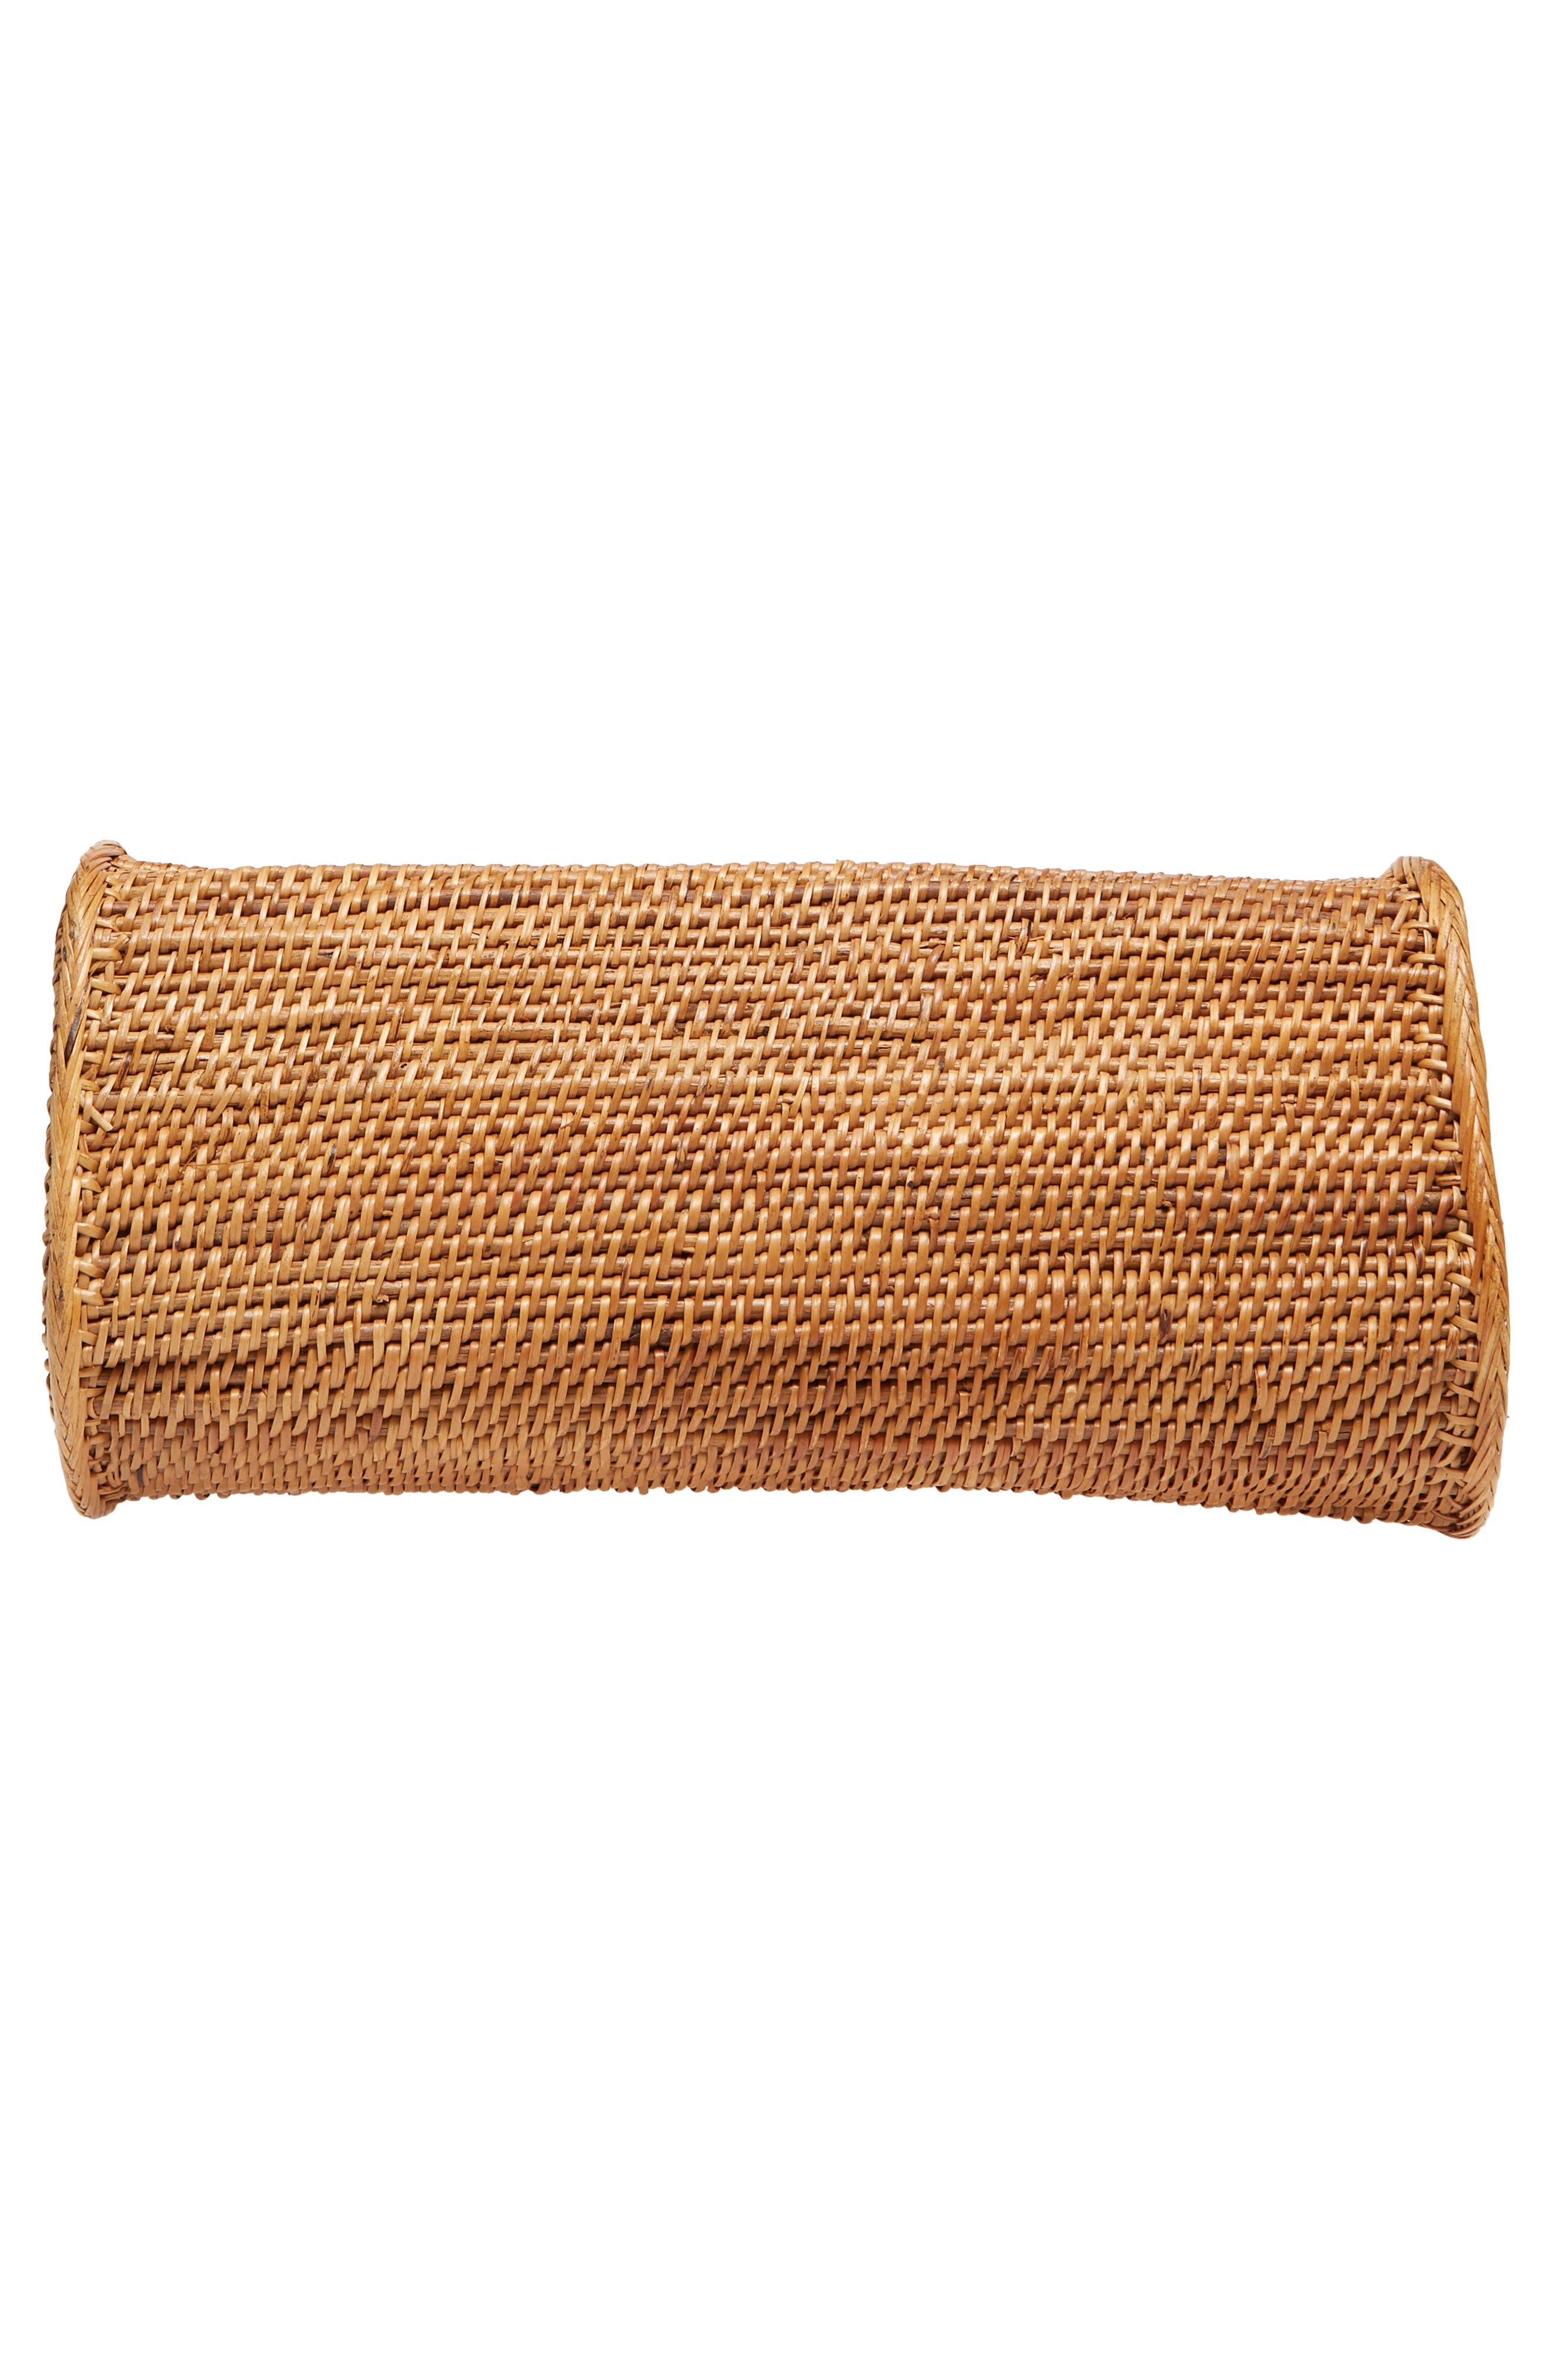 Woven Rattan Handbag,                             Alternate thumbnail 6, color,                             Tan